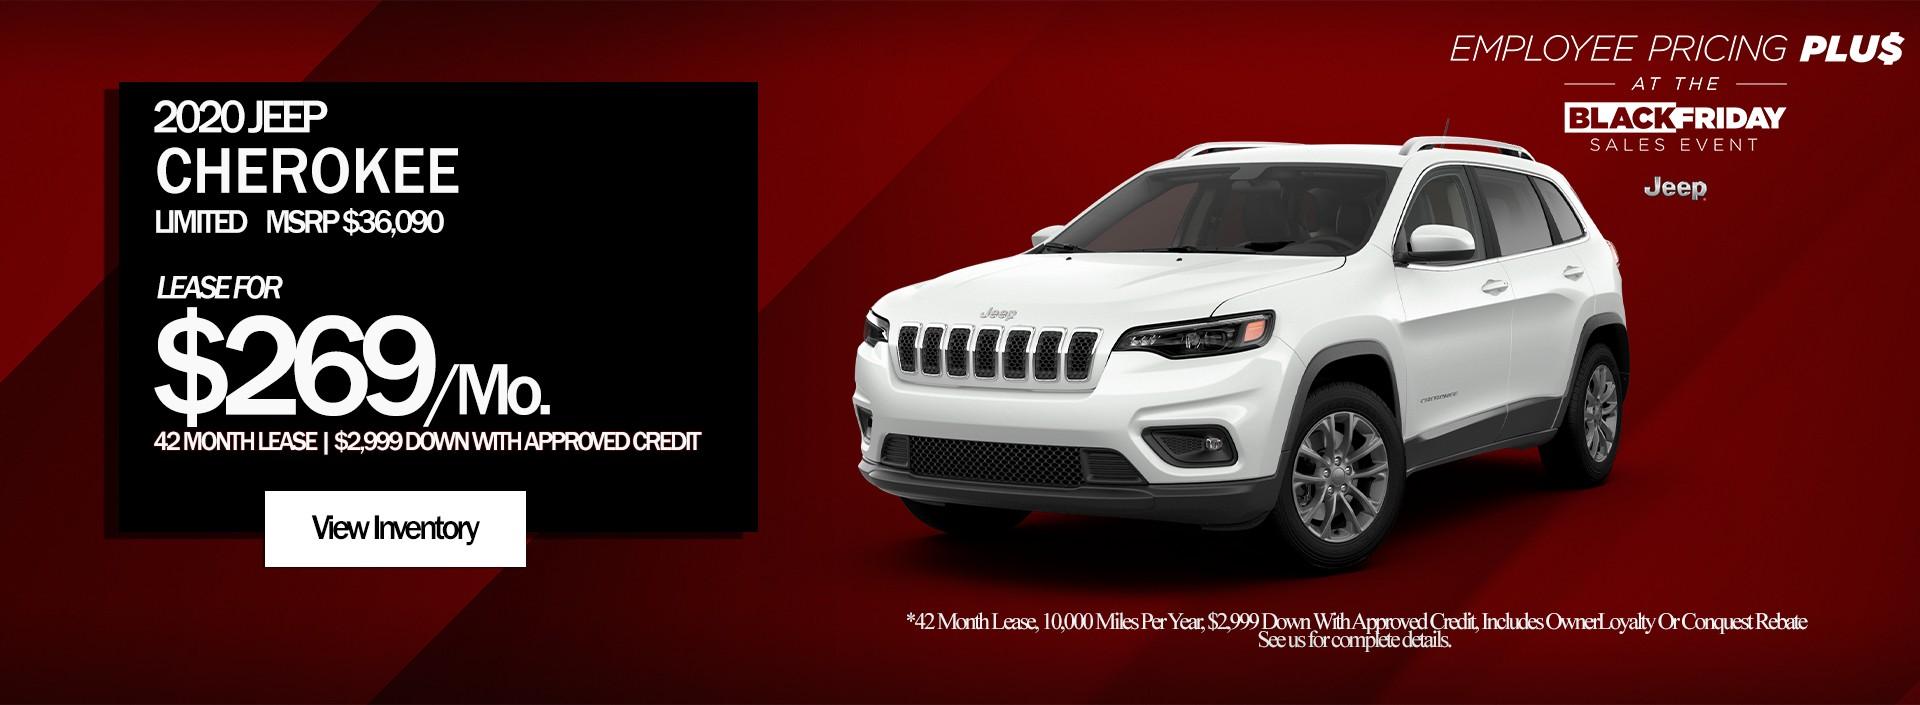 Jeep Cherokee Black Friday Special